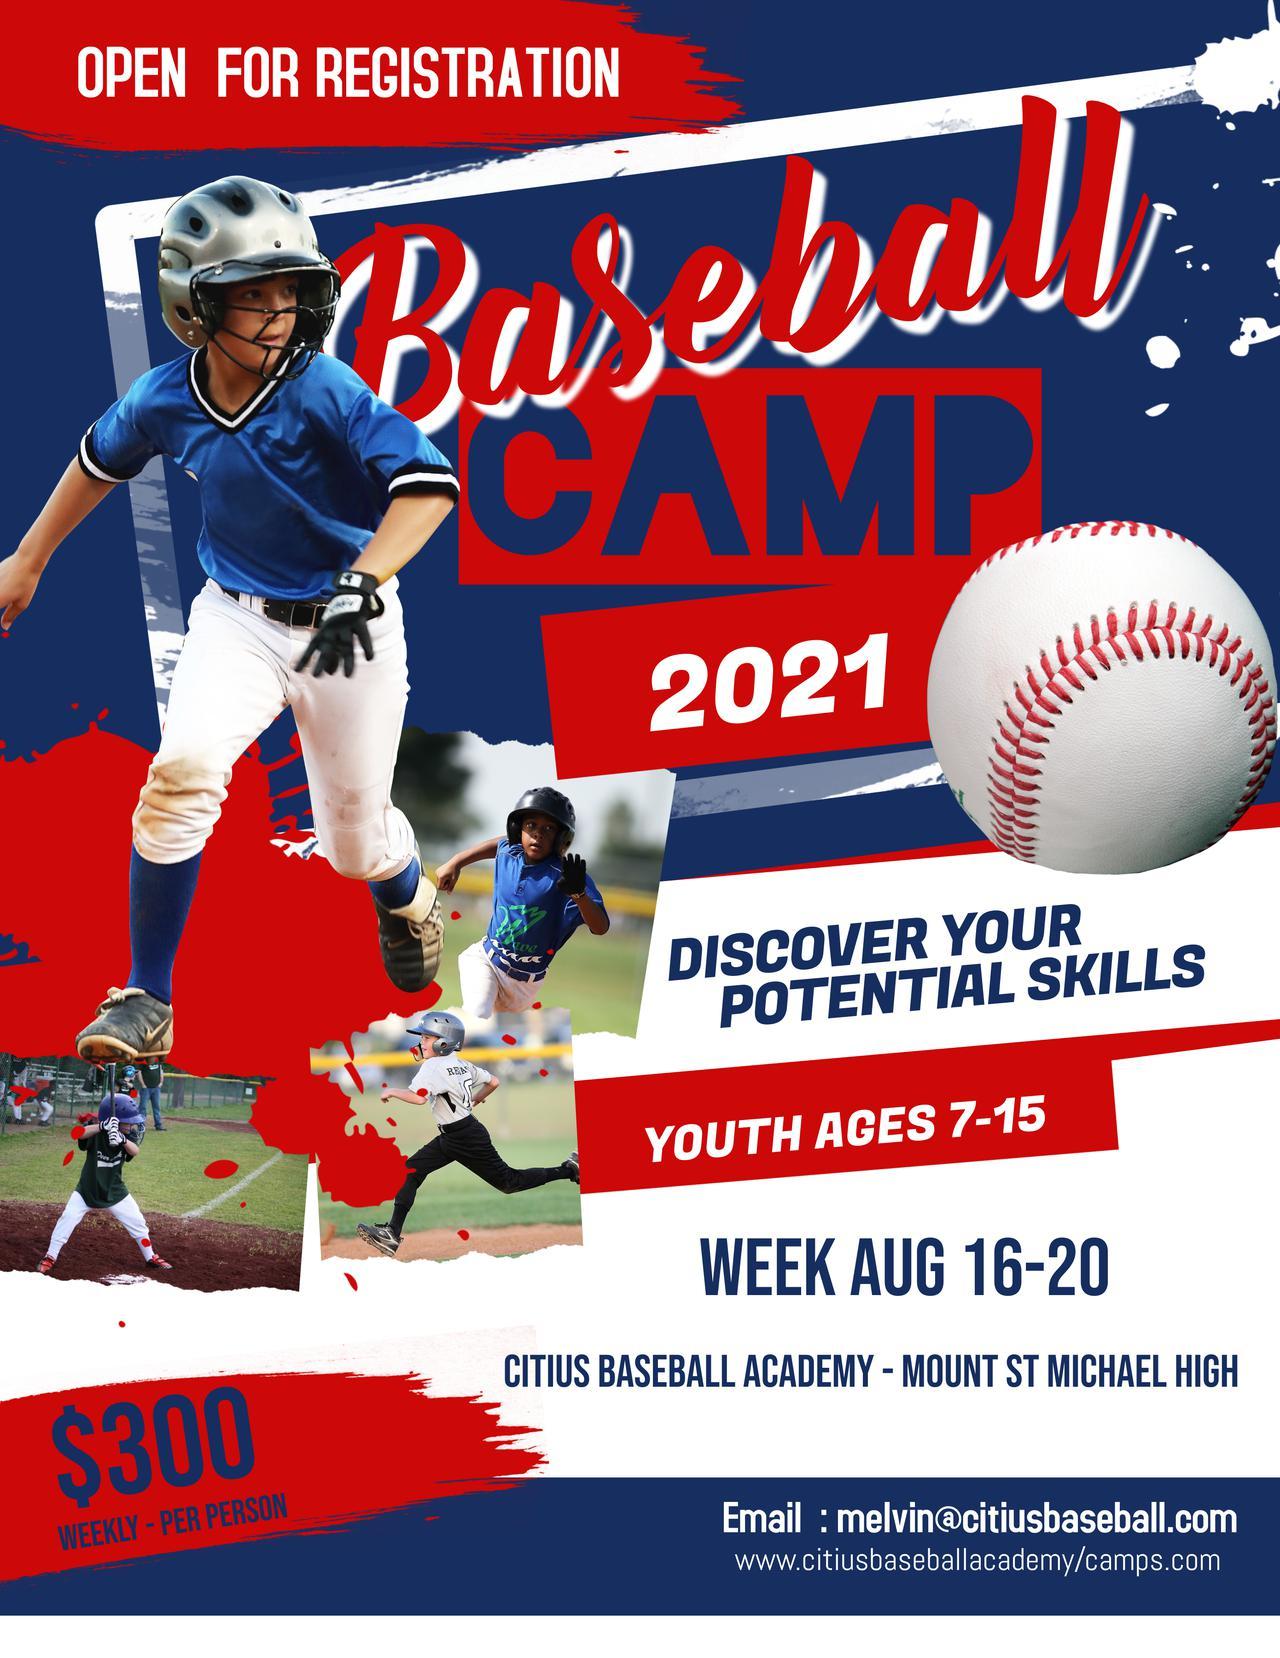 copy of baseball camp flyer poster.jpg